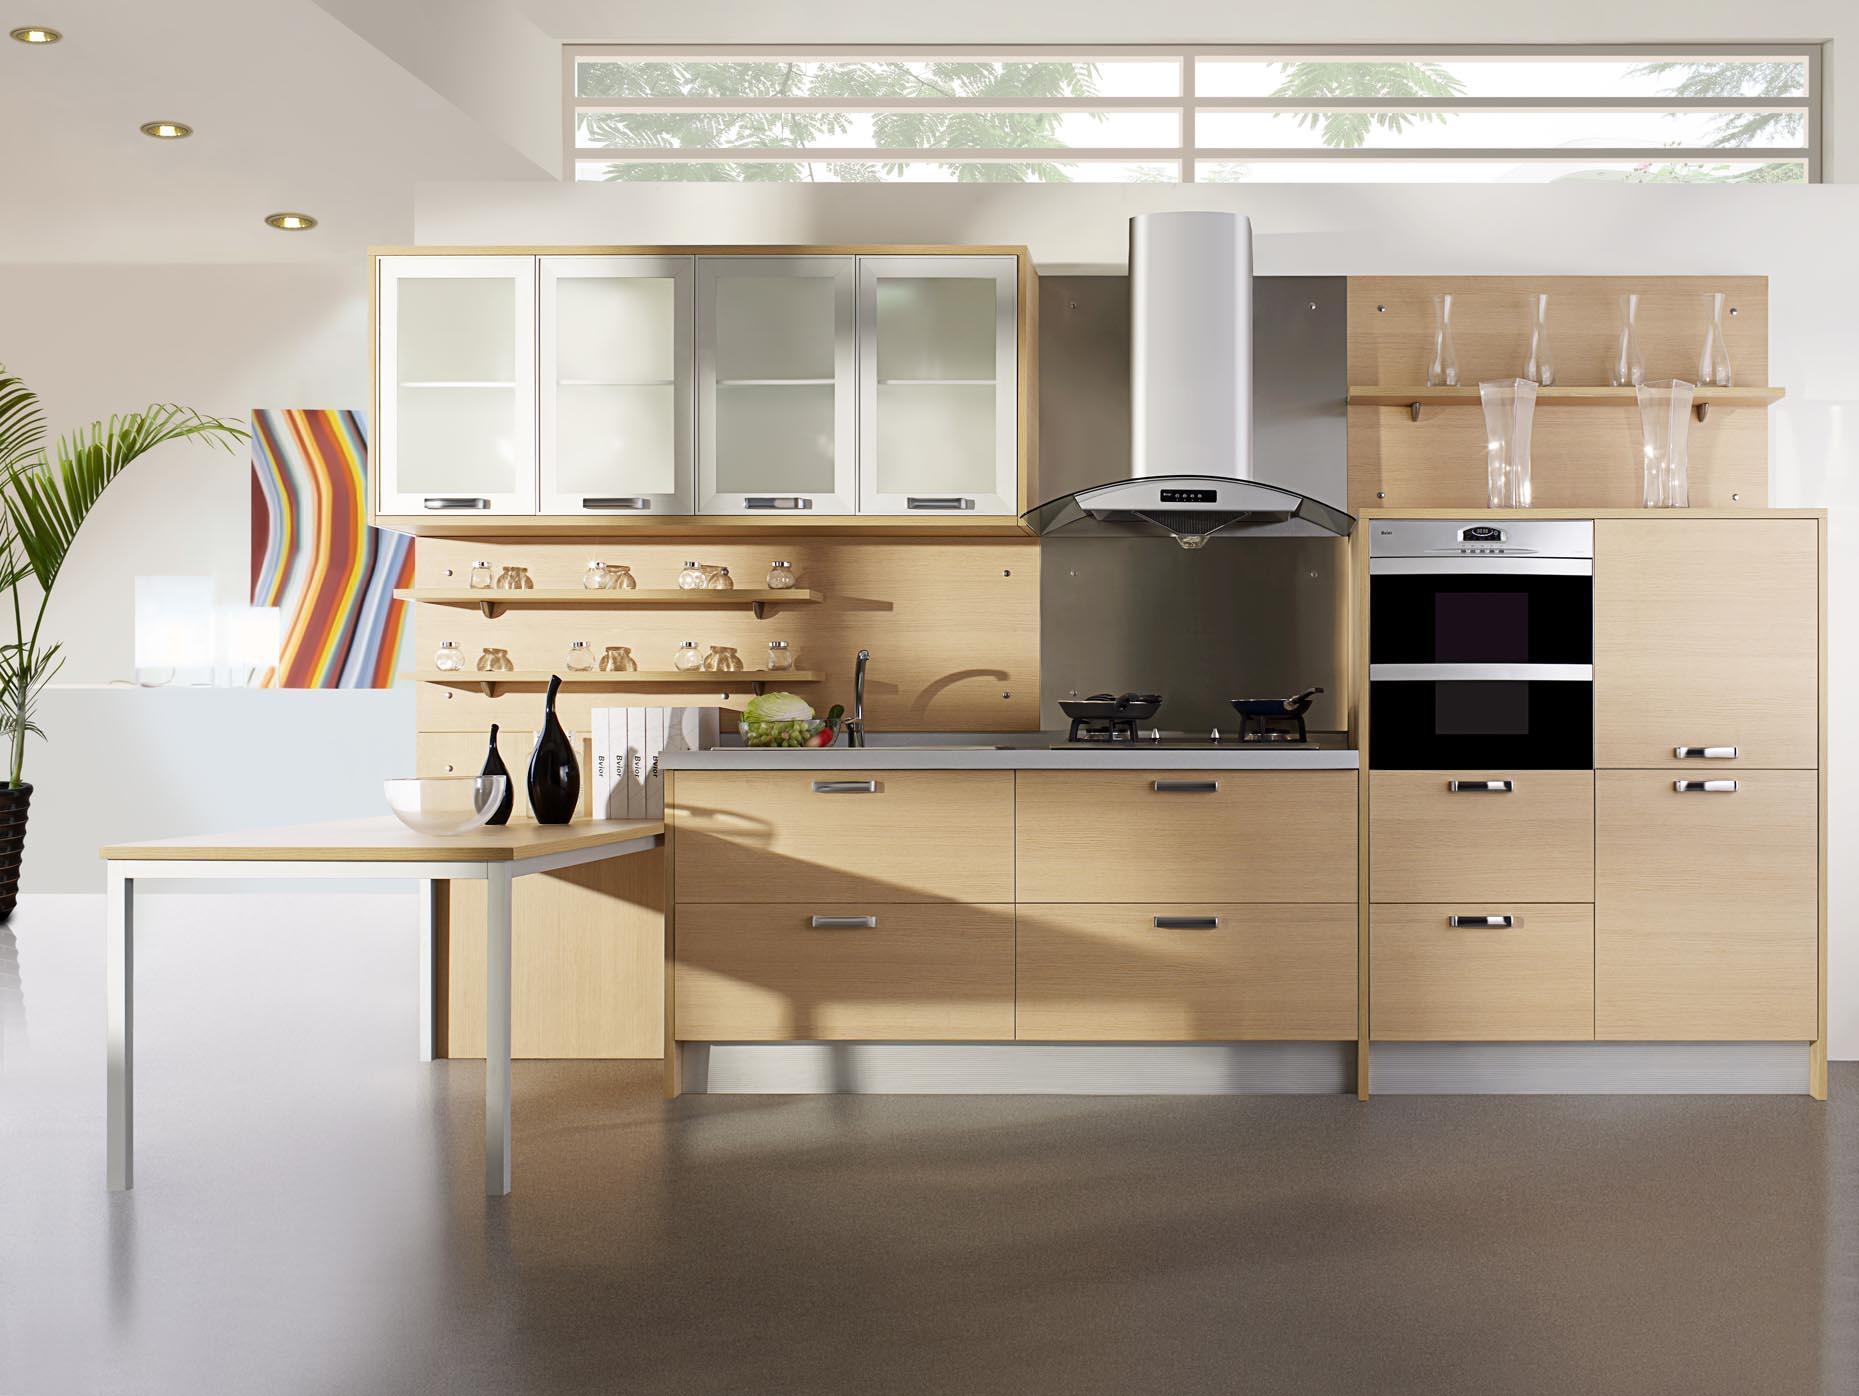 30 Modern Kitchen Design Ideas - The WoW Style on Modern Kitchen Design Ideas  id=81848